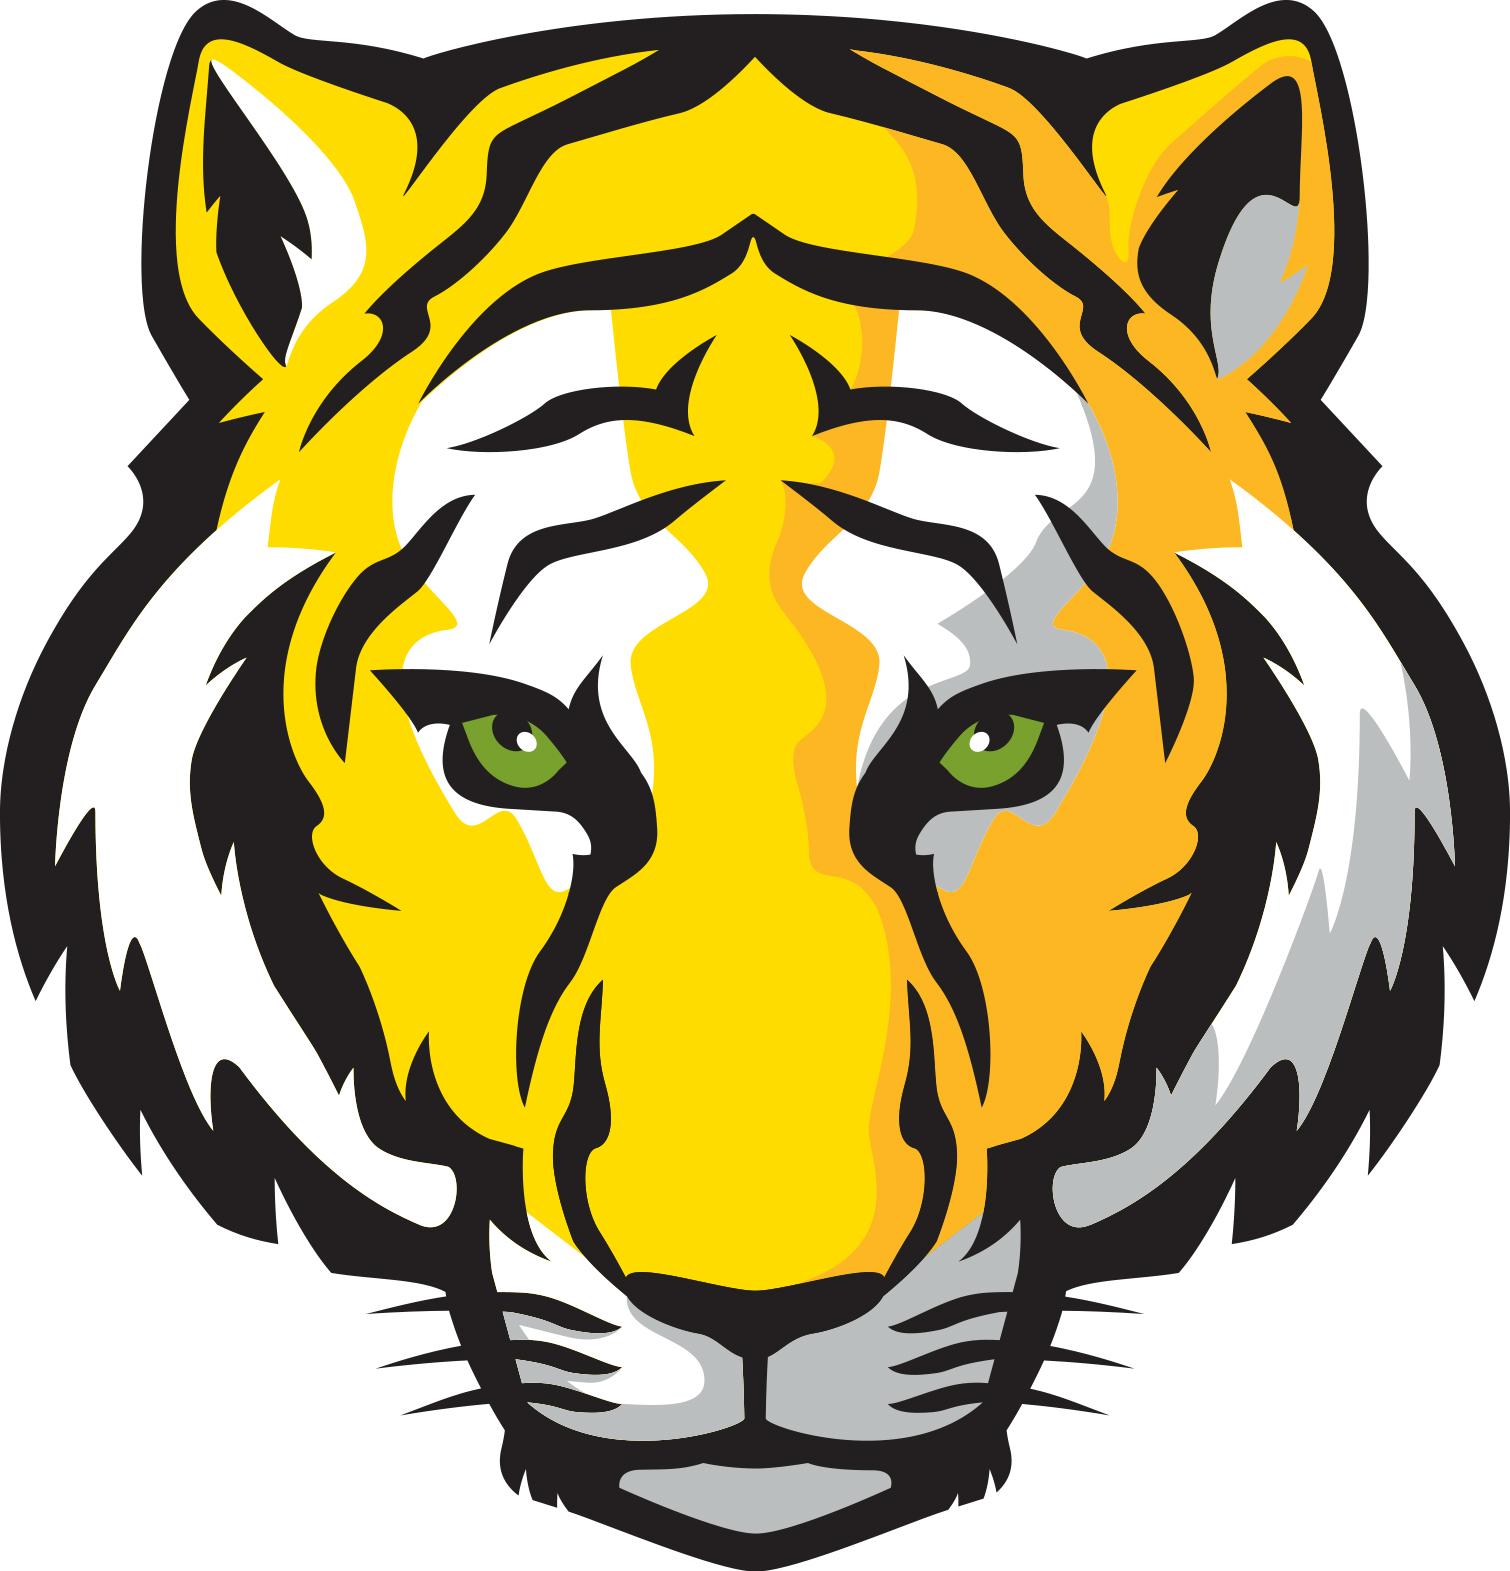 tiger head logo - HD1510×1571